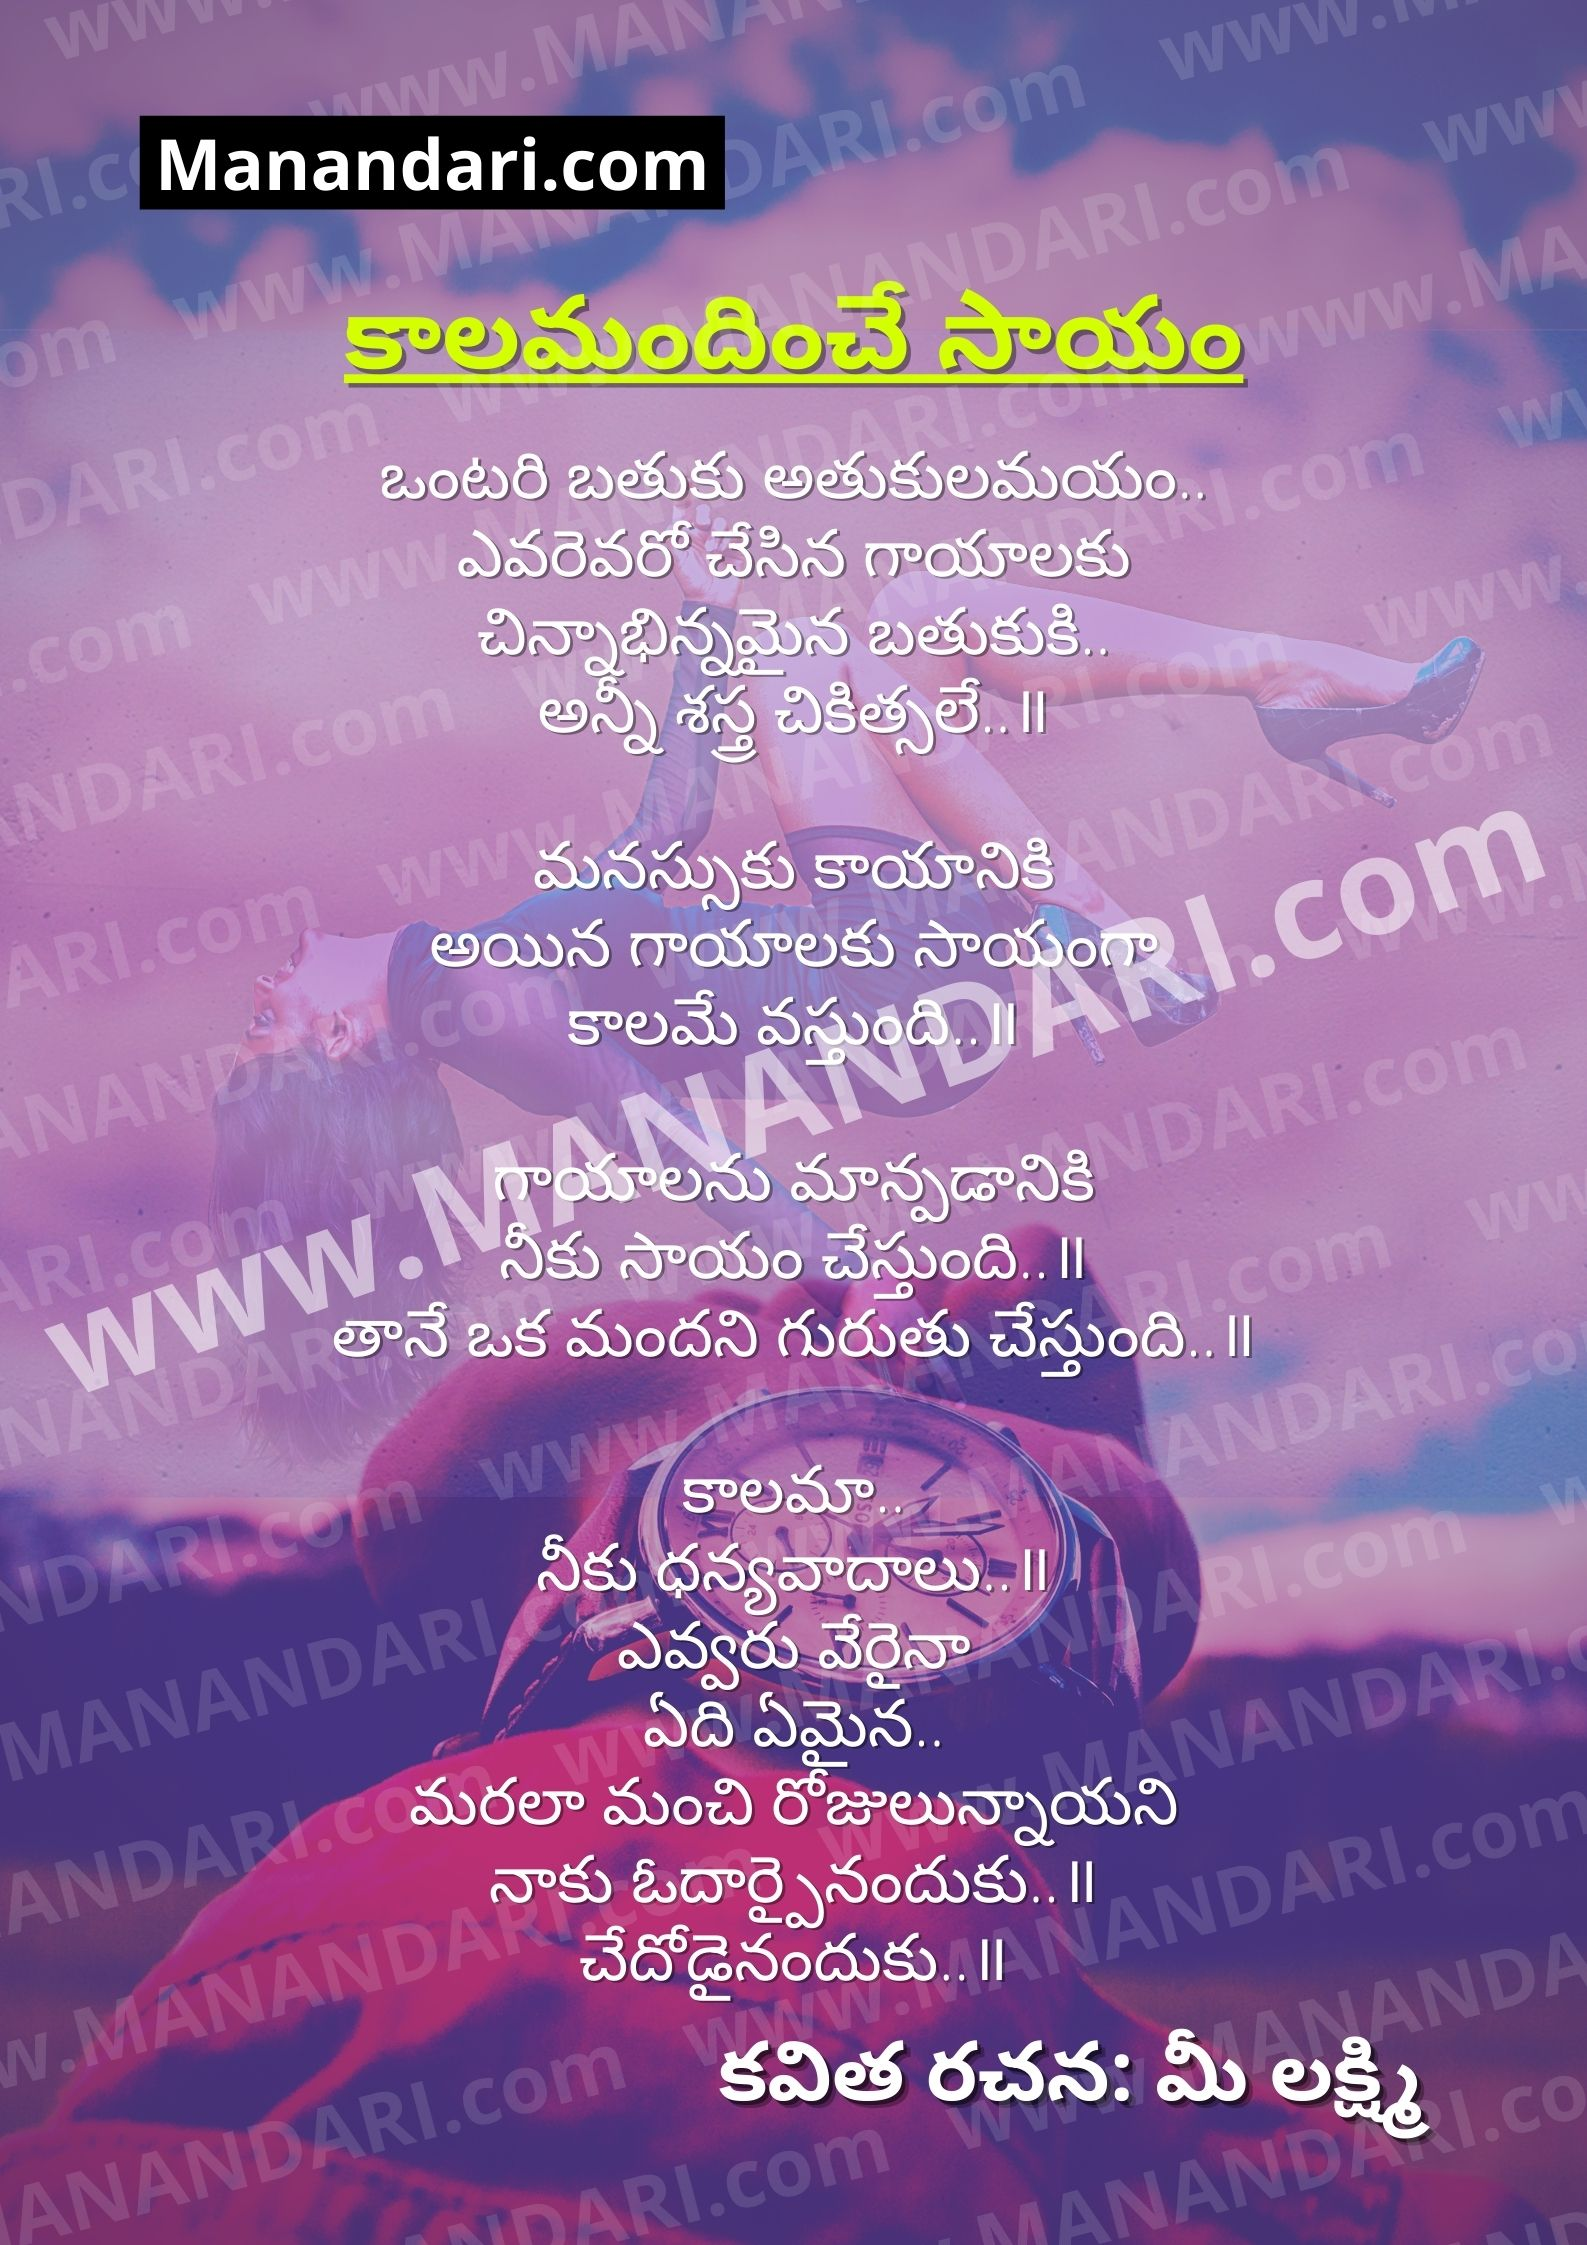 Kaalamandinche Saayam kavita by Mee Lakshmi